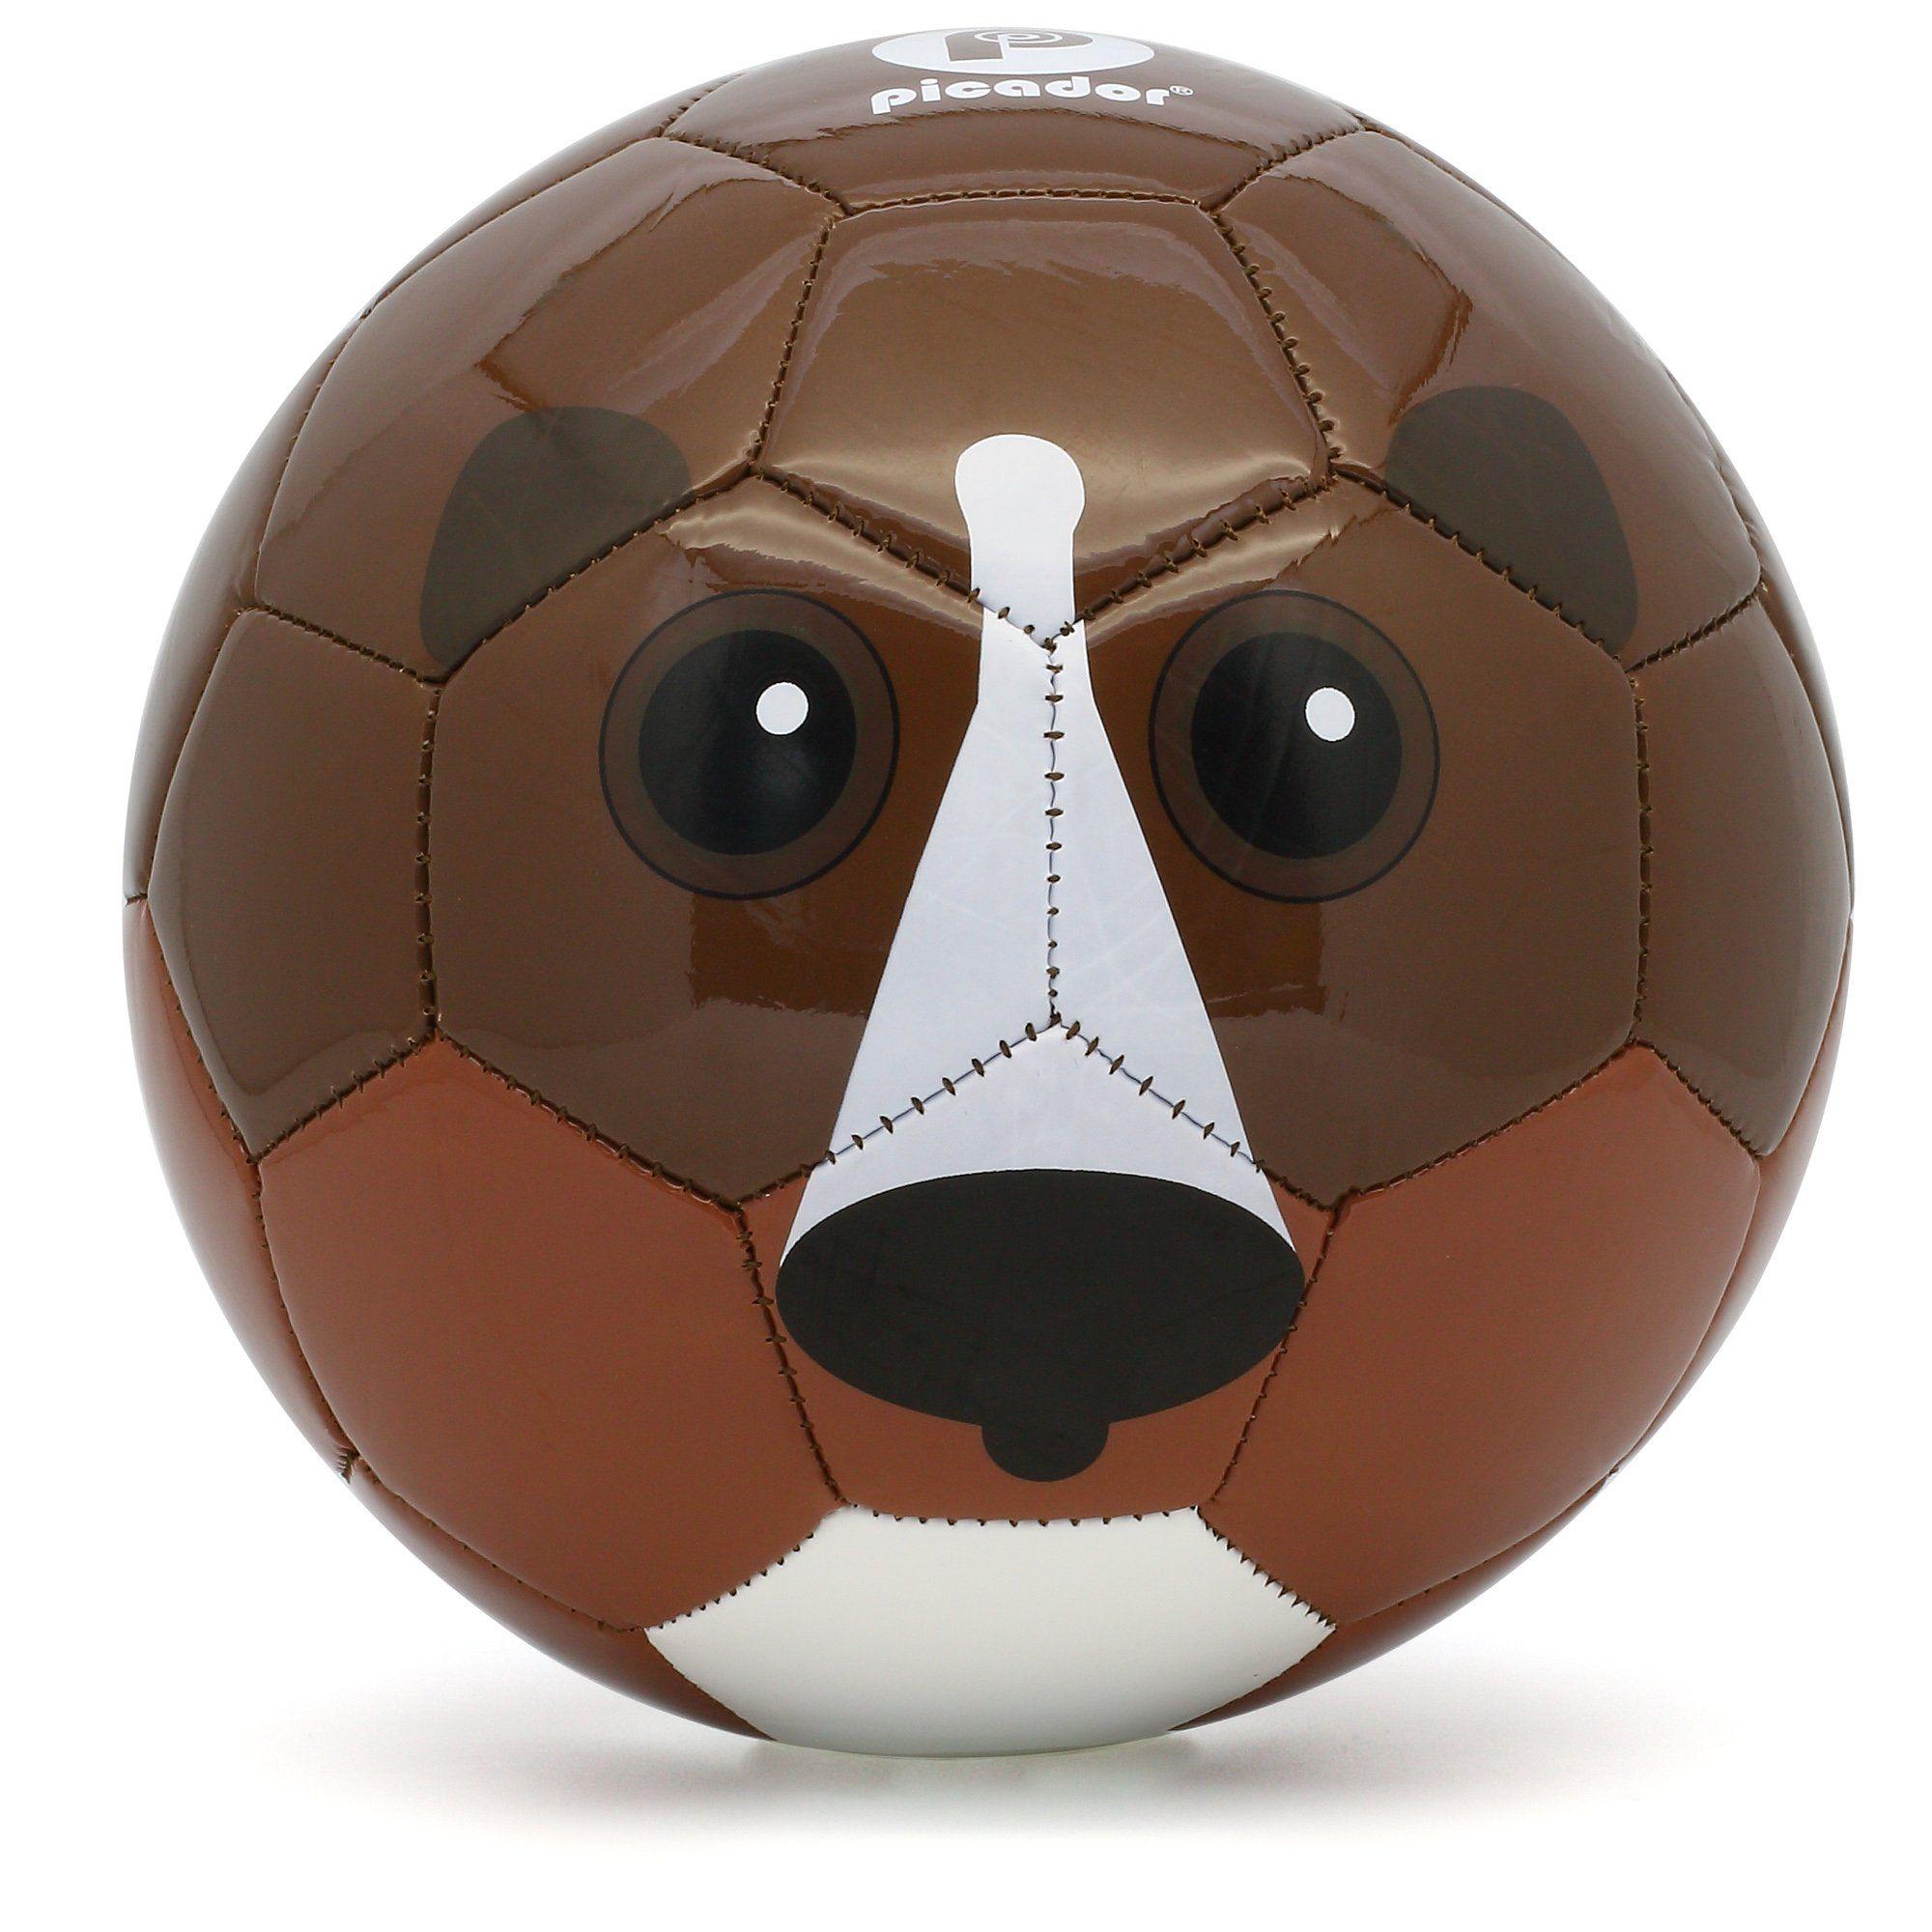 Picador Cute Cartoon Design Soccer Ball Size 3 For Kids Brown Bear Material Durable Tpu 100 Eco Friendly Rubber S Cartoon Design Soccer Ball Cute Cartoon